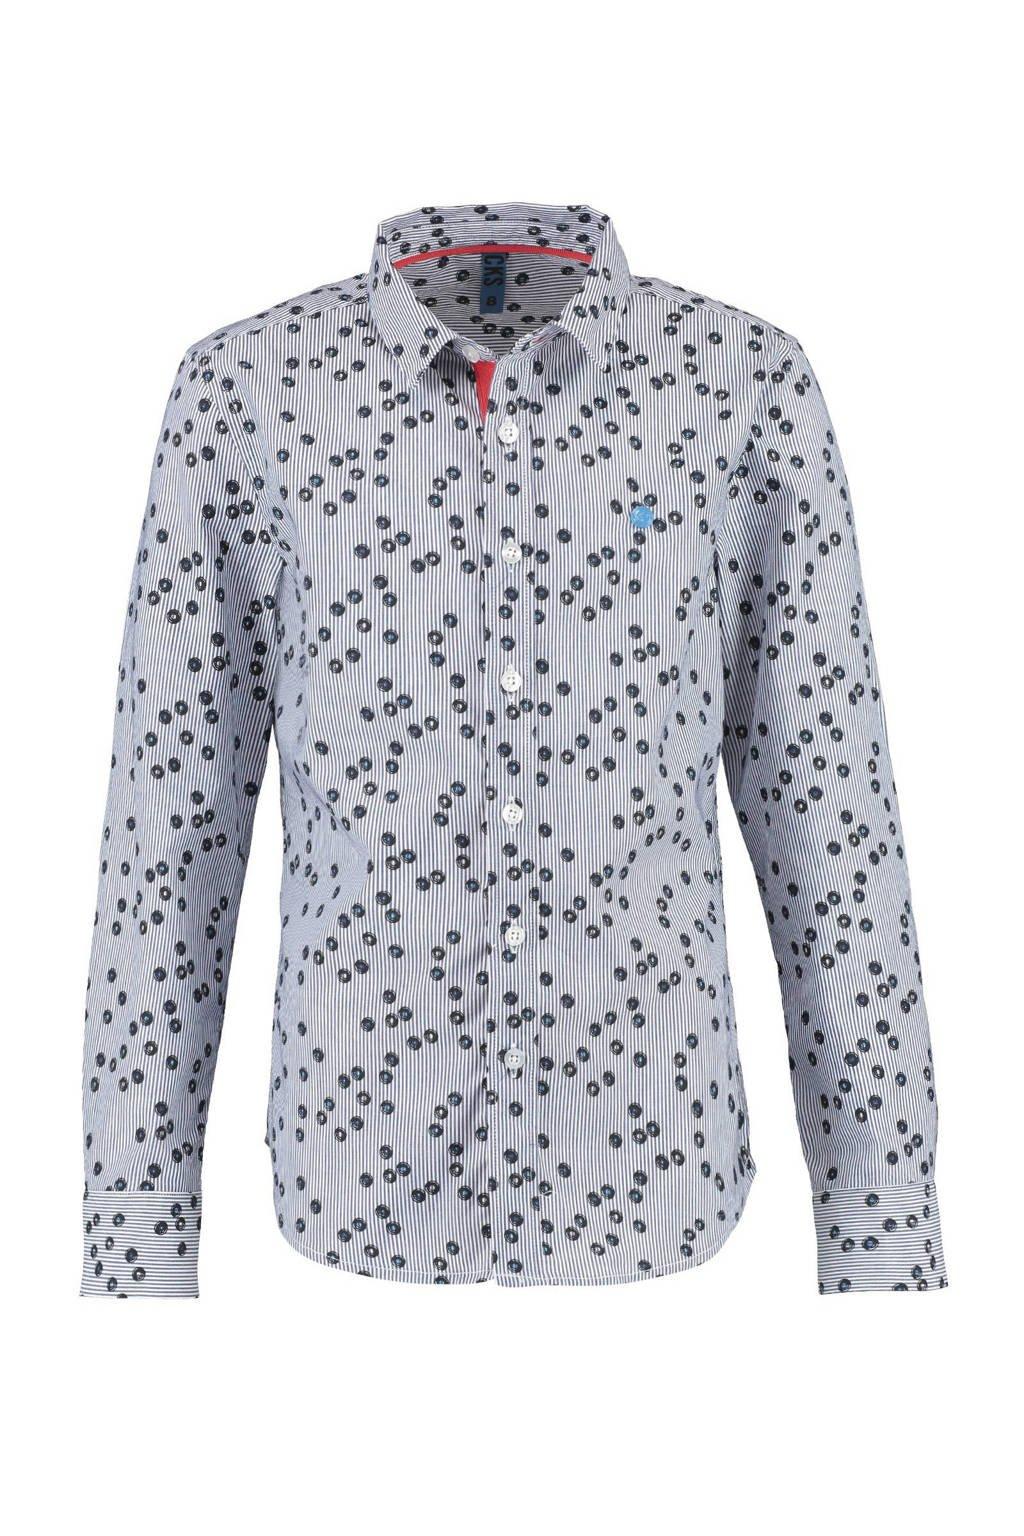 CKS KIDS overhemd Bosoen met all over print blauw, Blauw